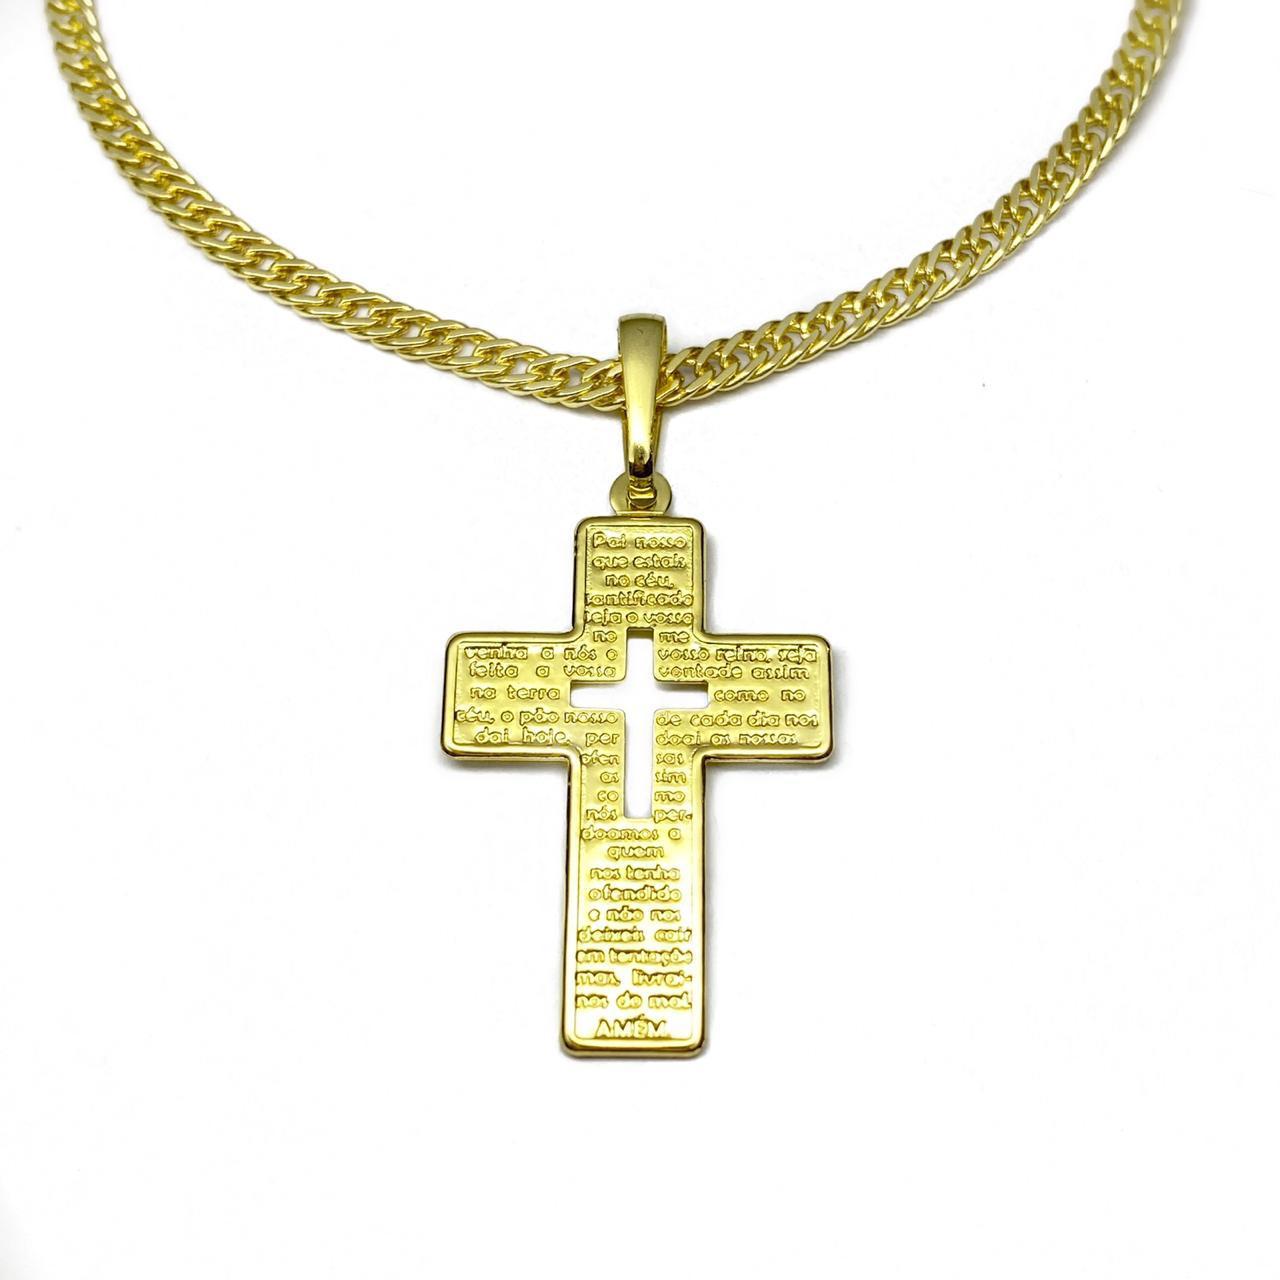 Kit Corrente Double Grumet 3mm 70cm 12g (Fecho Gaveta) (Banho Ouro 24K) + Pingente Crucifixo Pai Nosso 3,3cm X 2,1cm (Banho Ouro 24k)